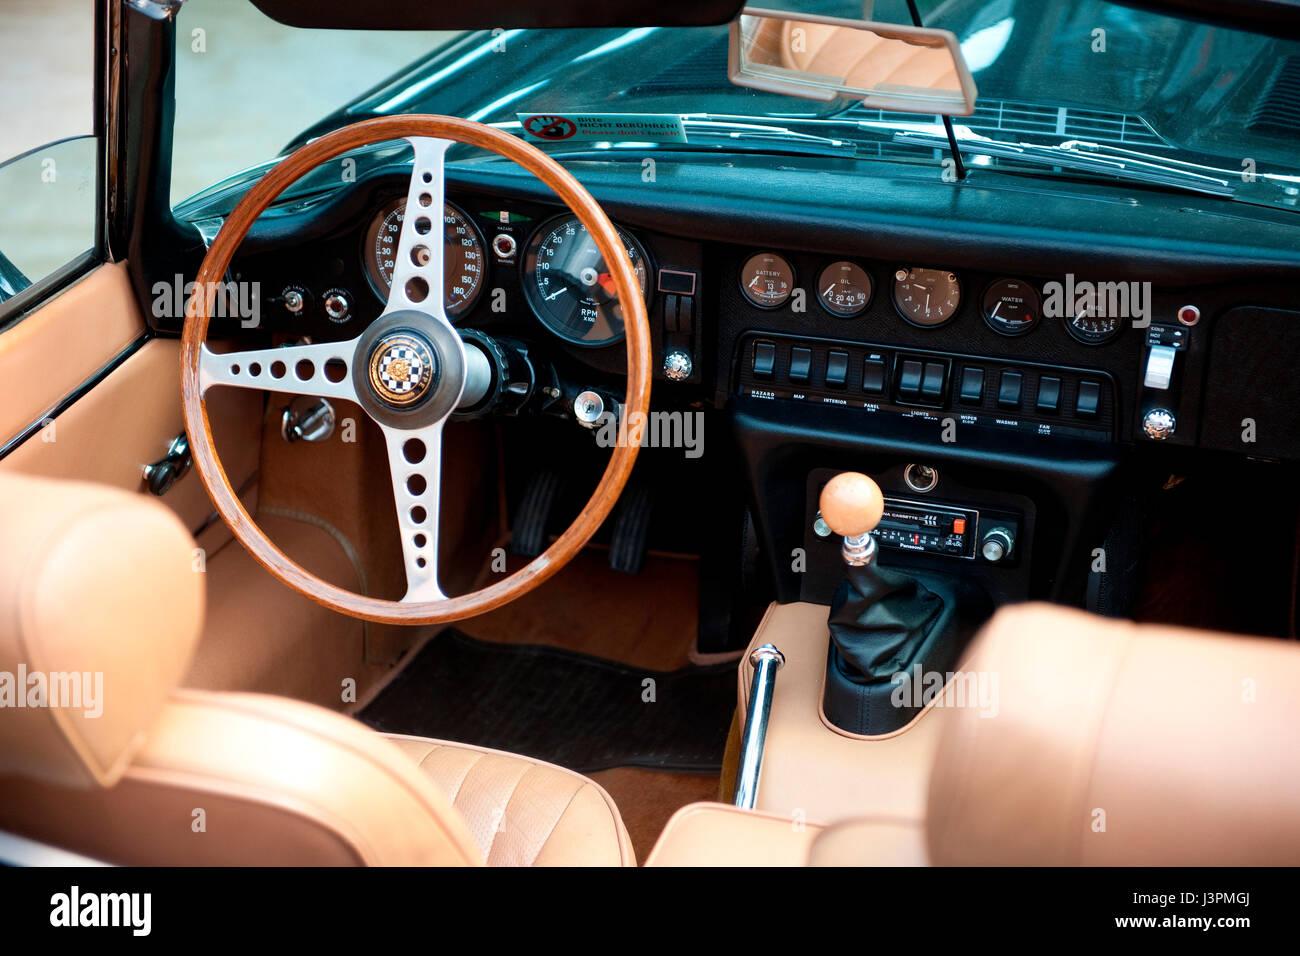 Jaguar E Type Classic Car Cockpit With Wooden Steering Wheel Gear